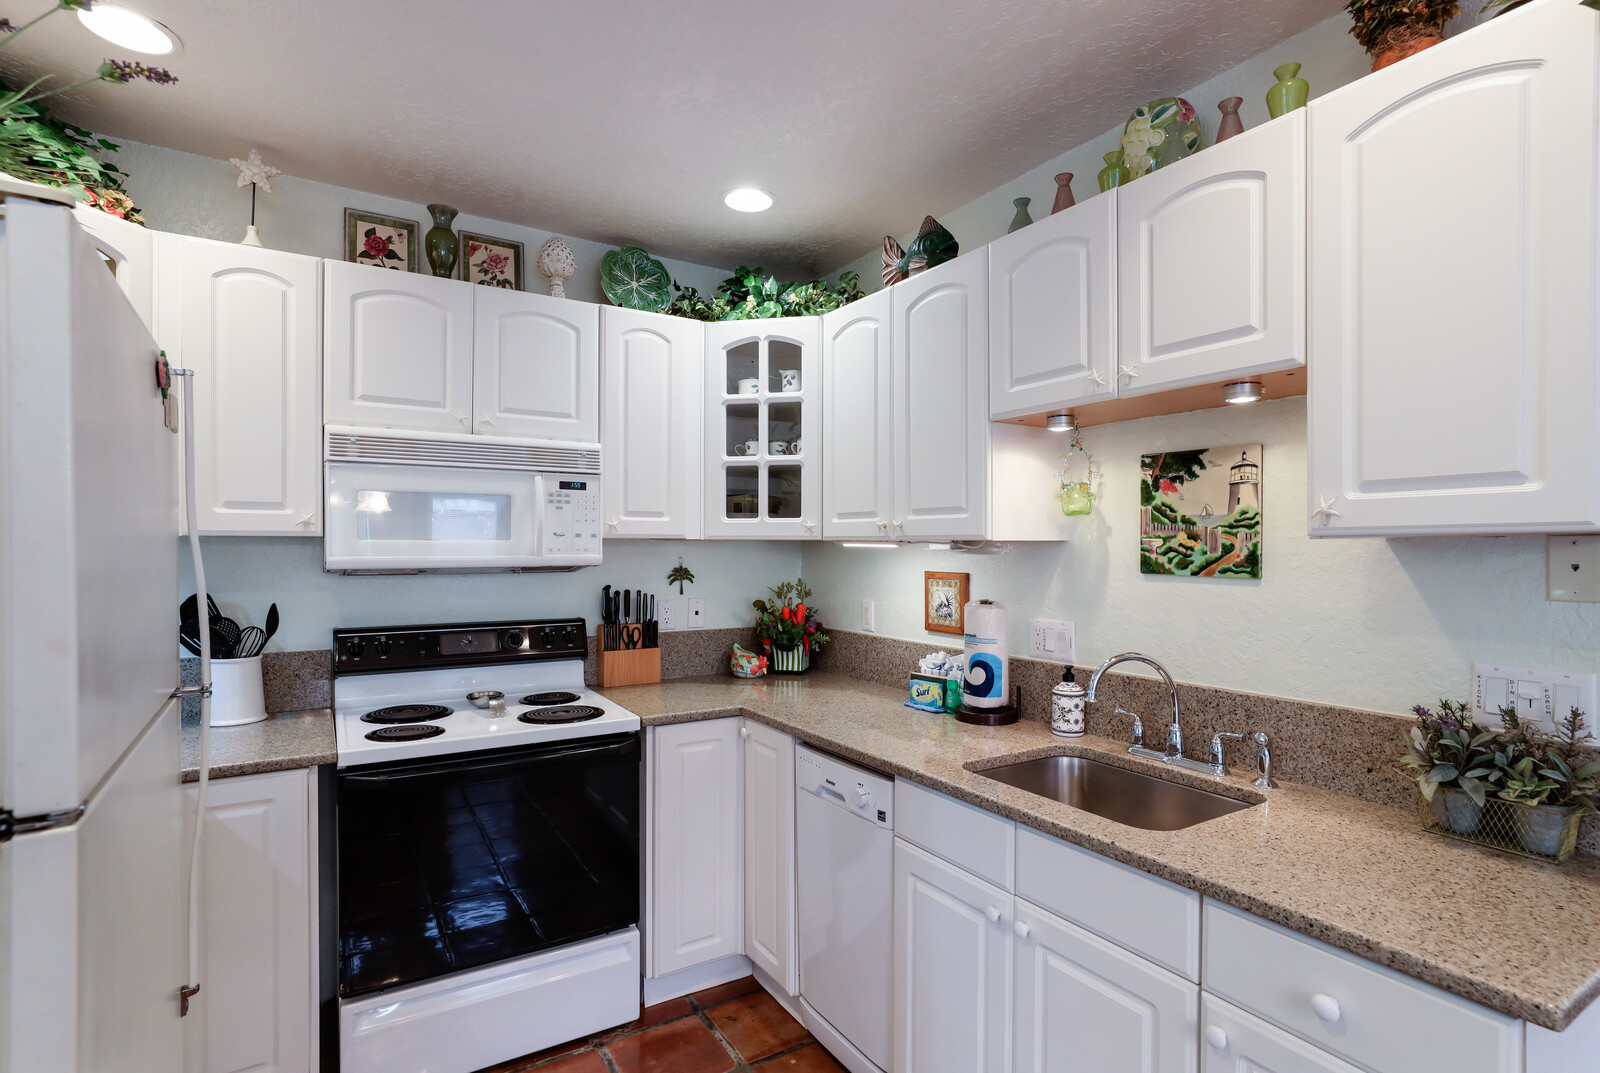 Hibiscus kitchen with dishwasher